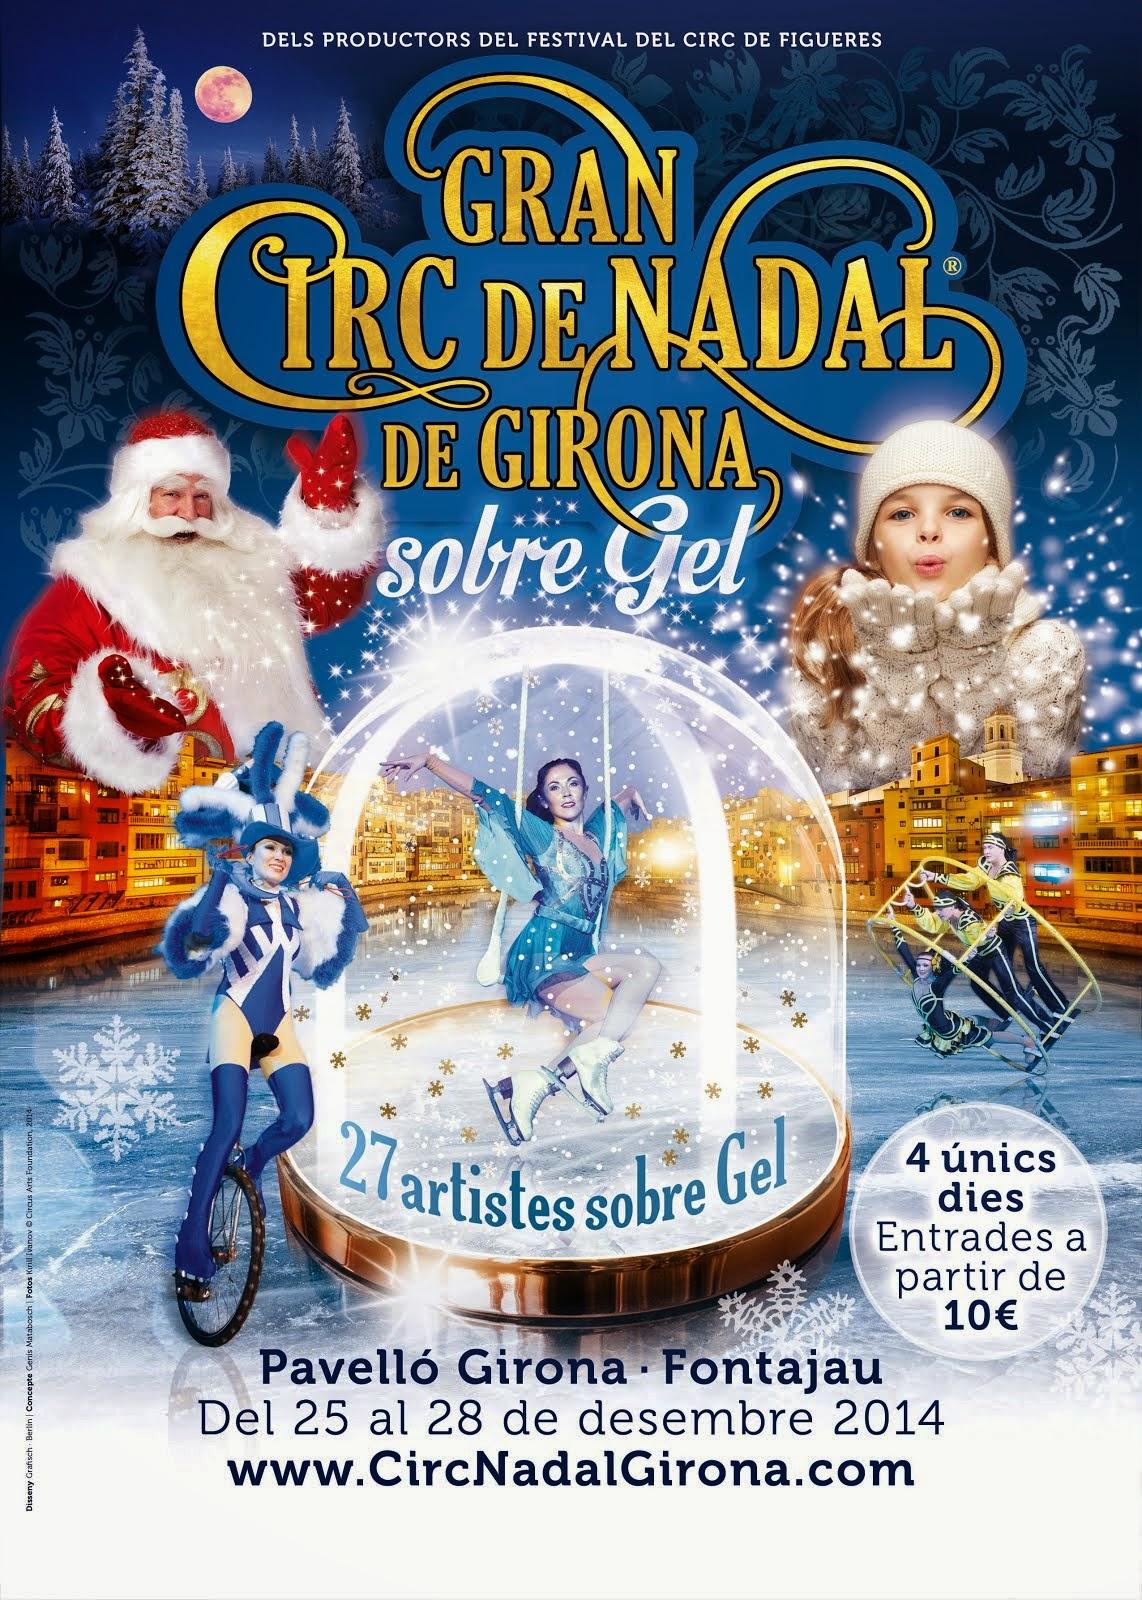 Burguscircus média officiel du Grand cirque de Noël Gérone